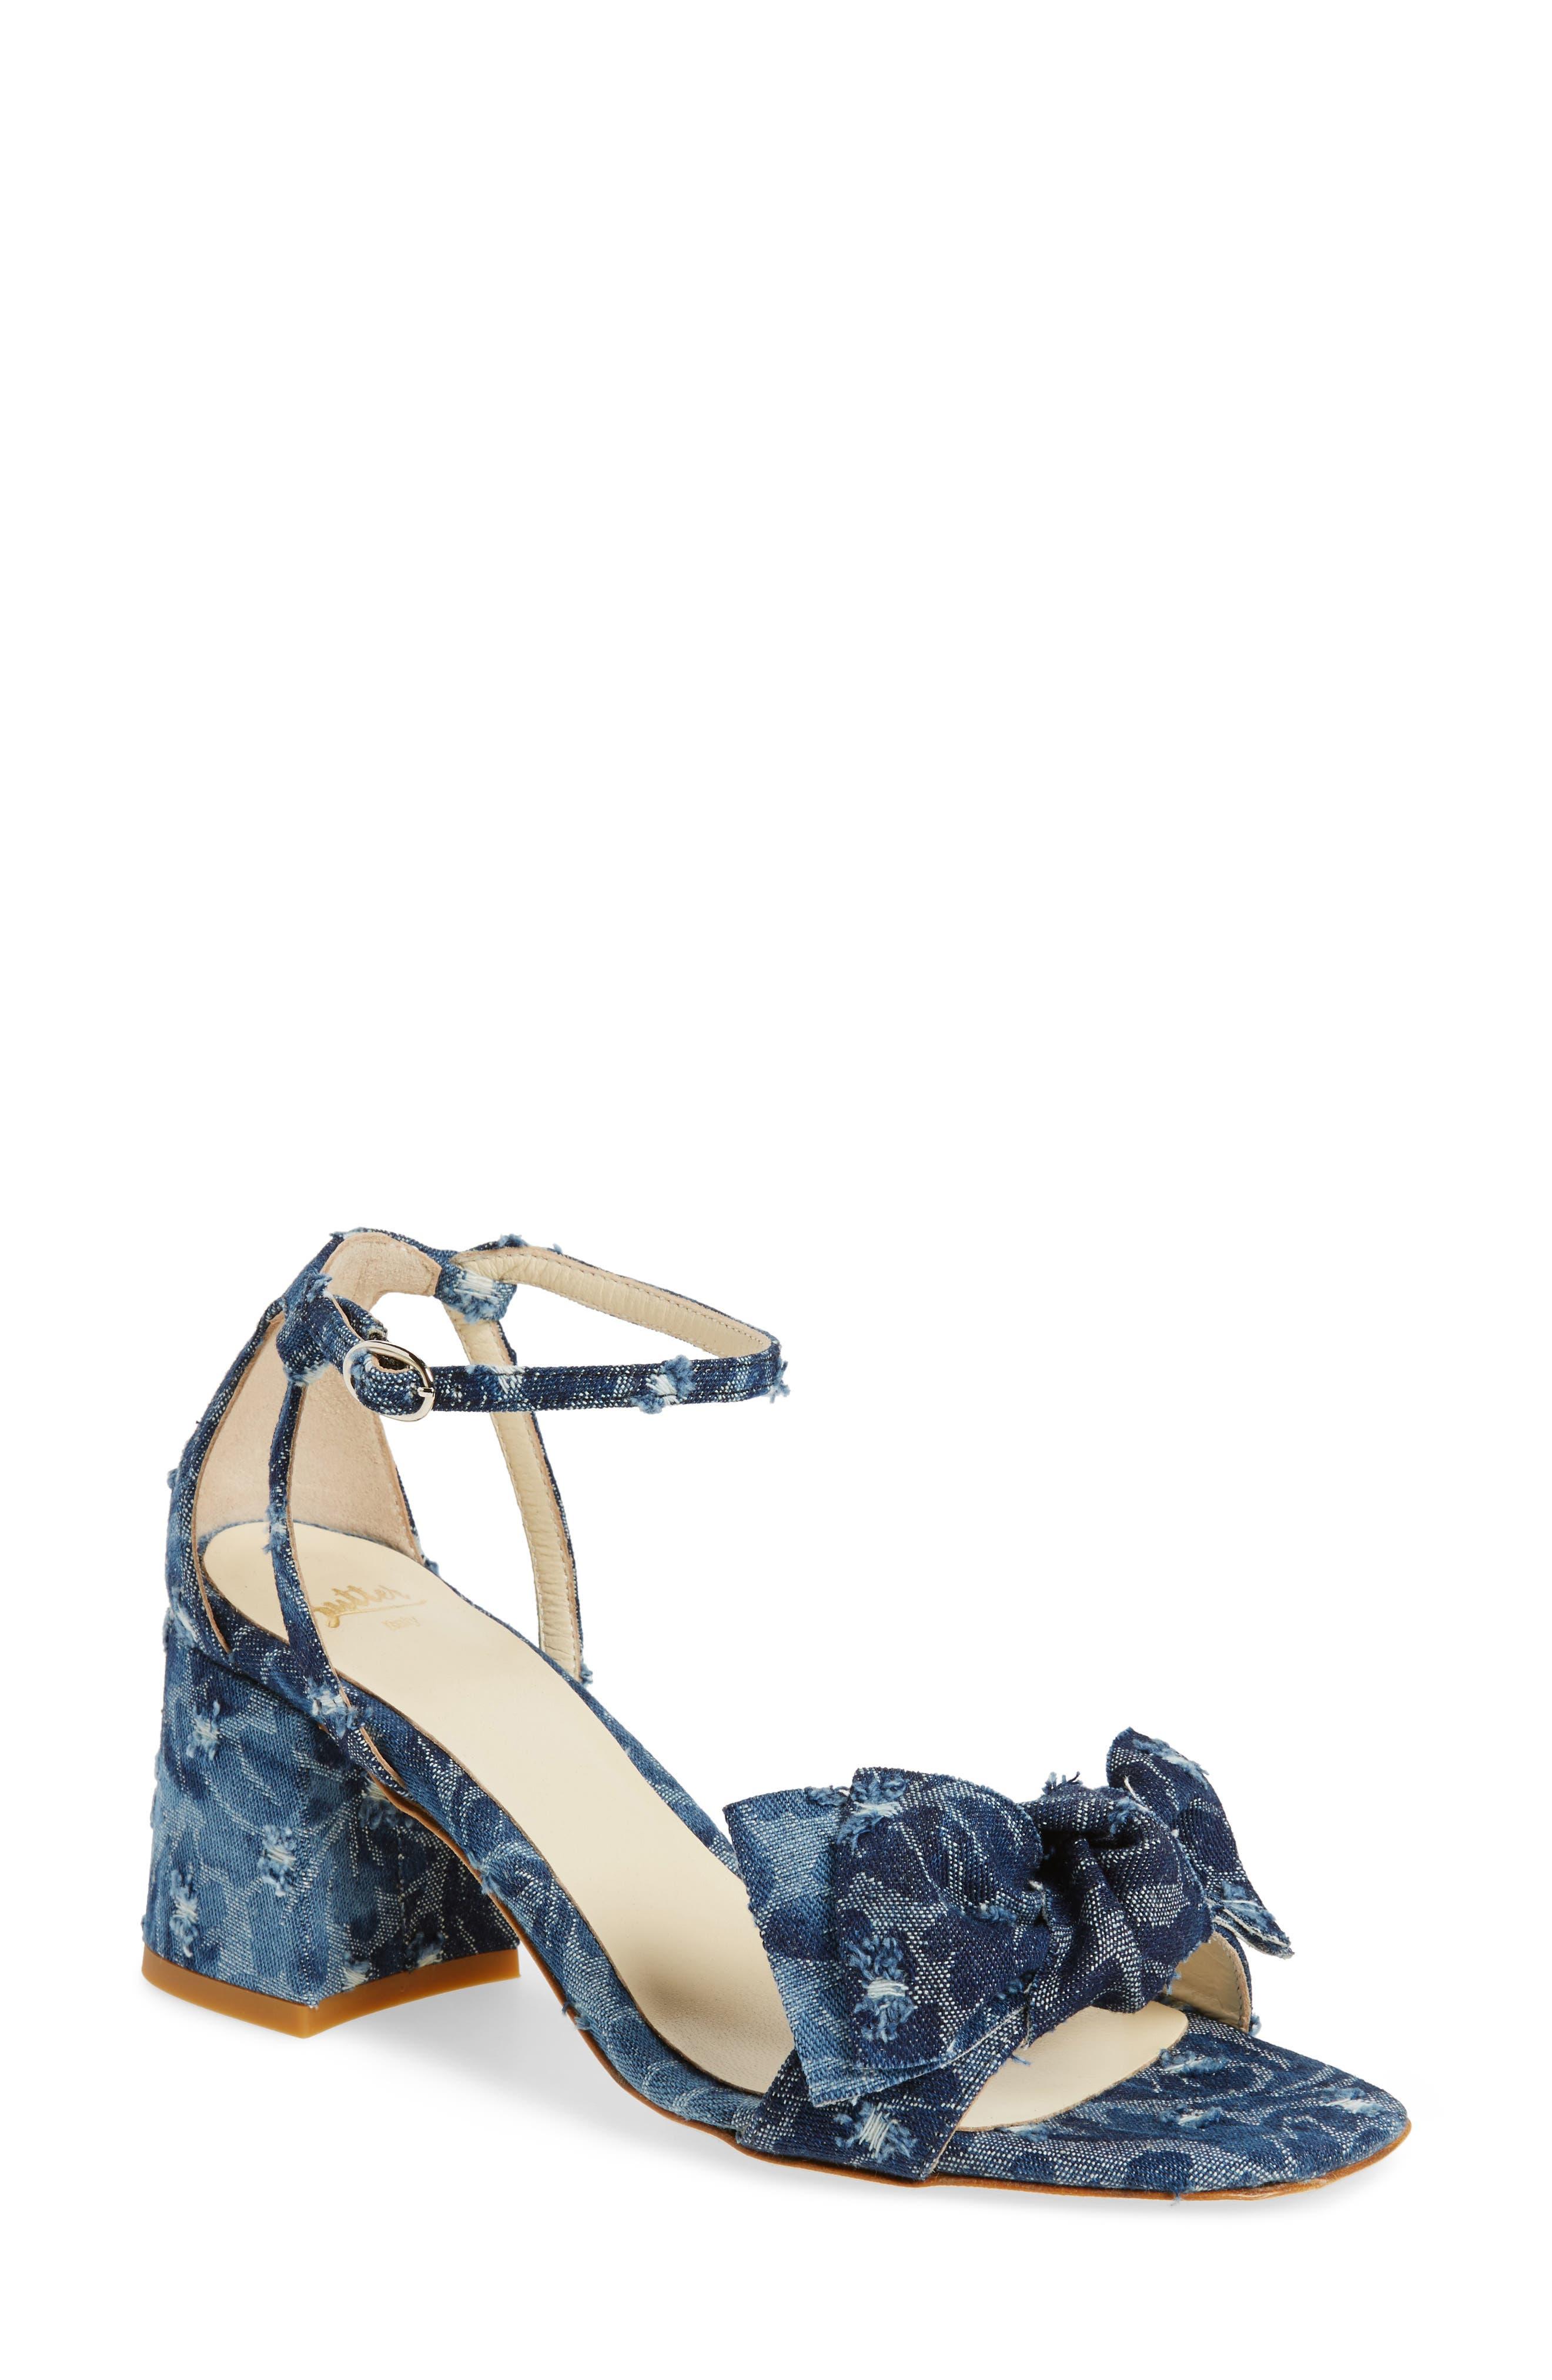 Butter Flower Sandal,                         Main,                         color, Jeans